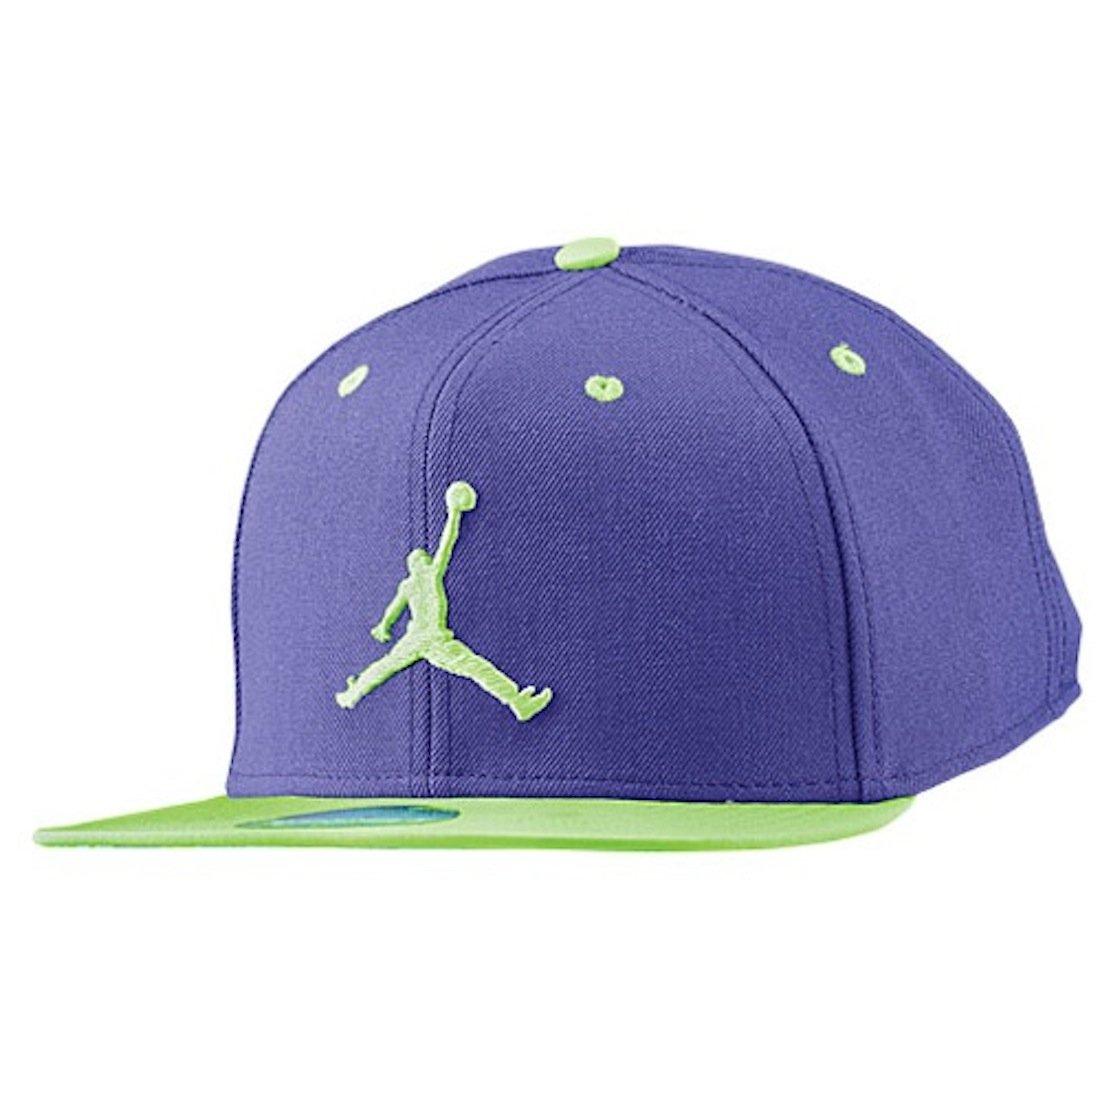 Nike Hombres de Air Jordan True Ele Bel Air Edition Gorra corte ...